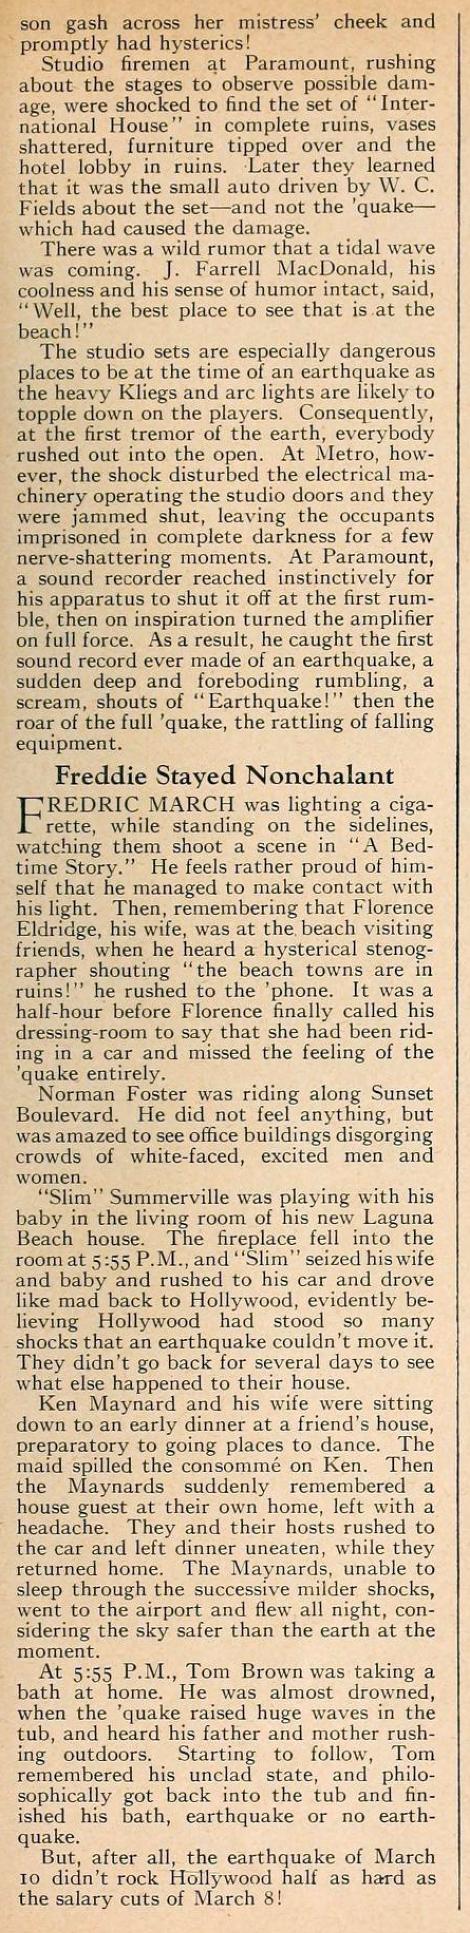 carole lombard motion picture june 1933 earthquake 03a